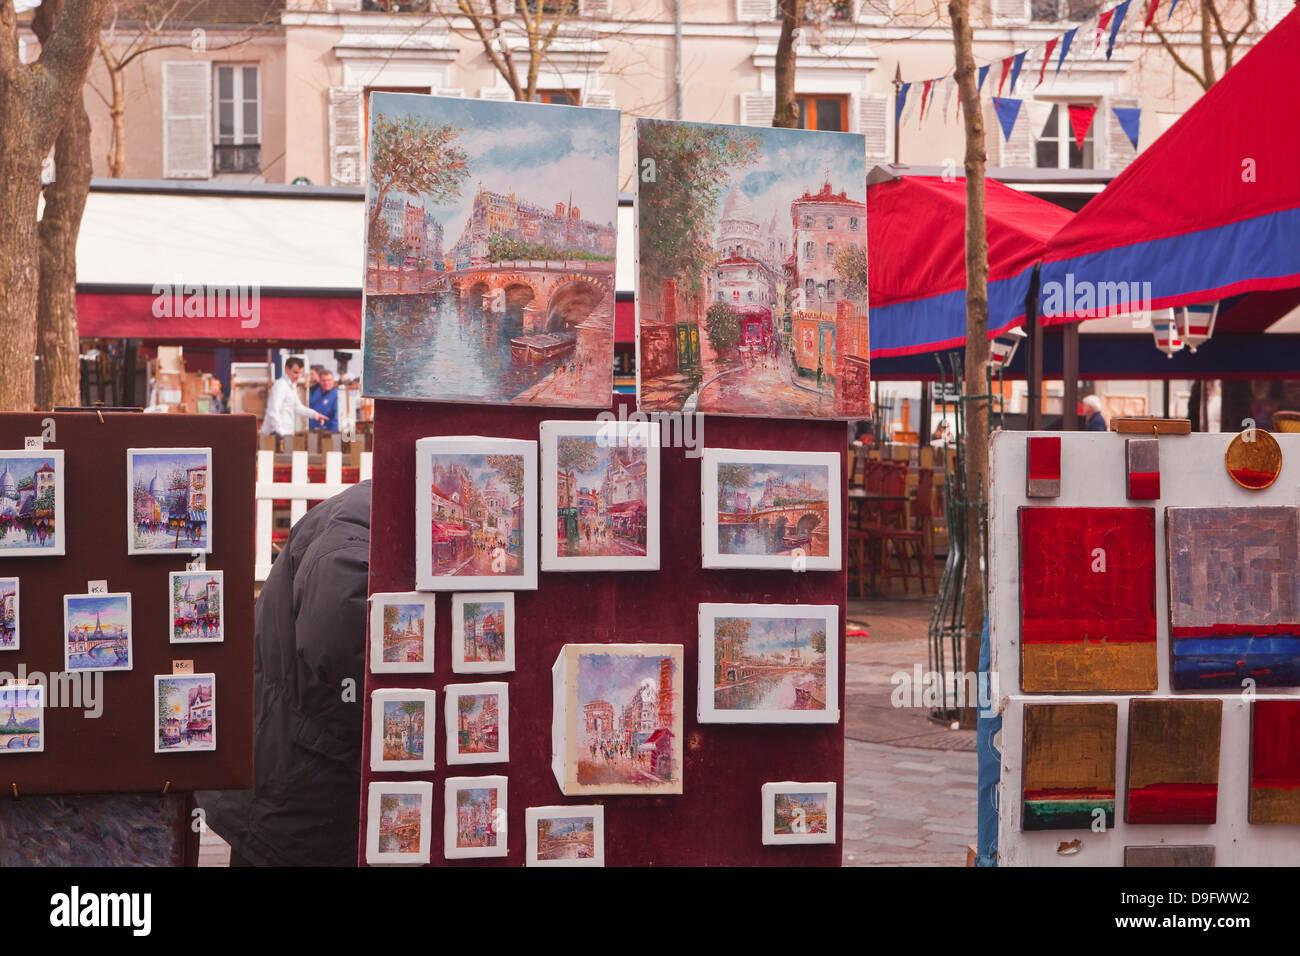 Gemälde zum Verkauf an die berühmten Place du Tertre in Montmartre, Paris, Frankreich Stockbild